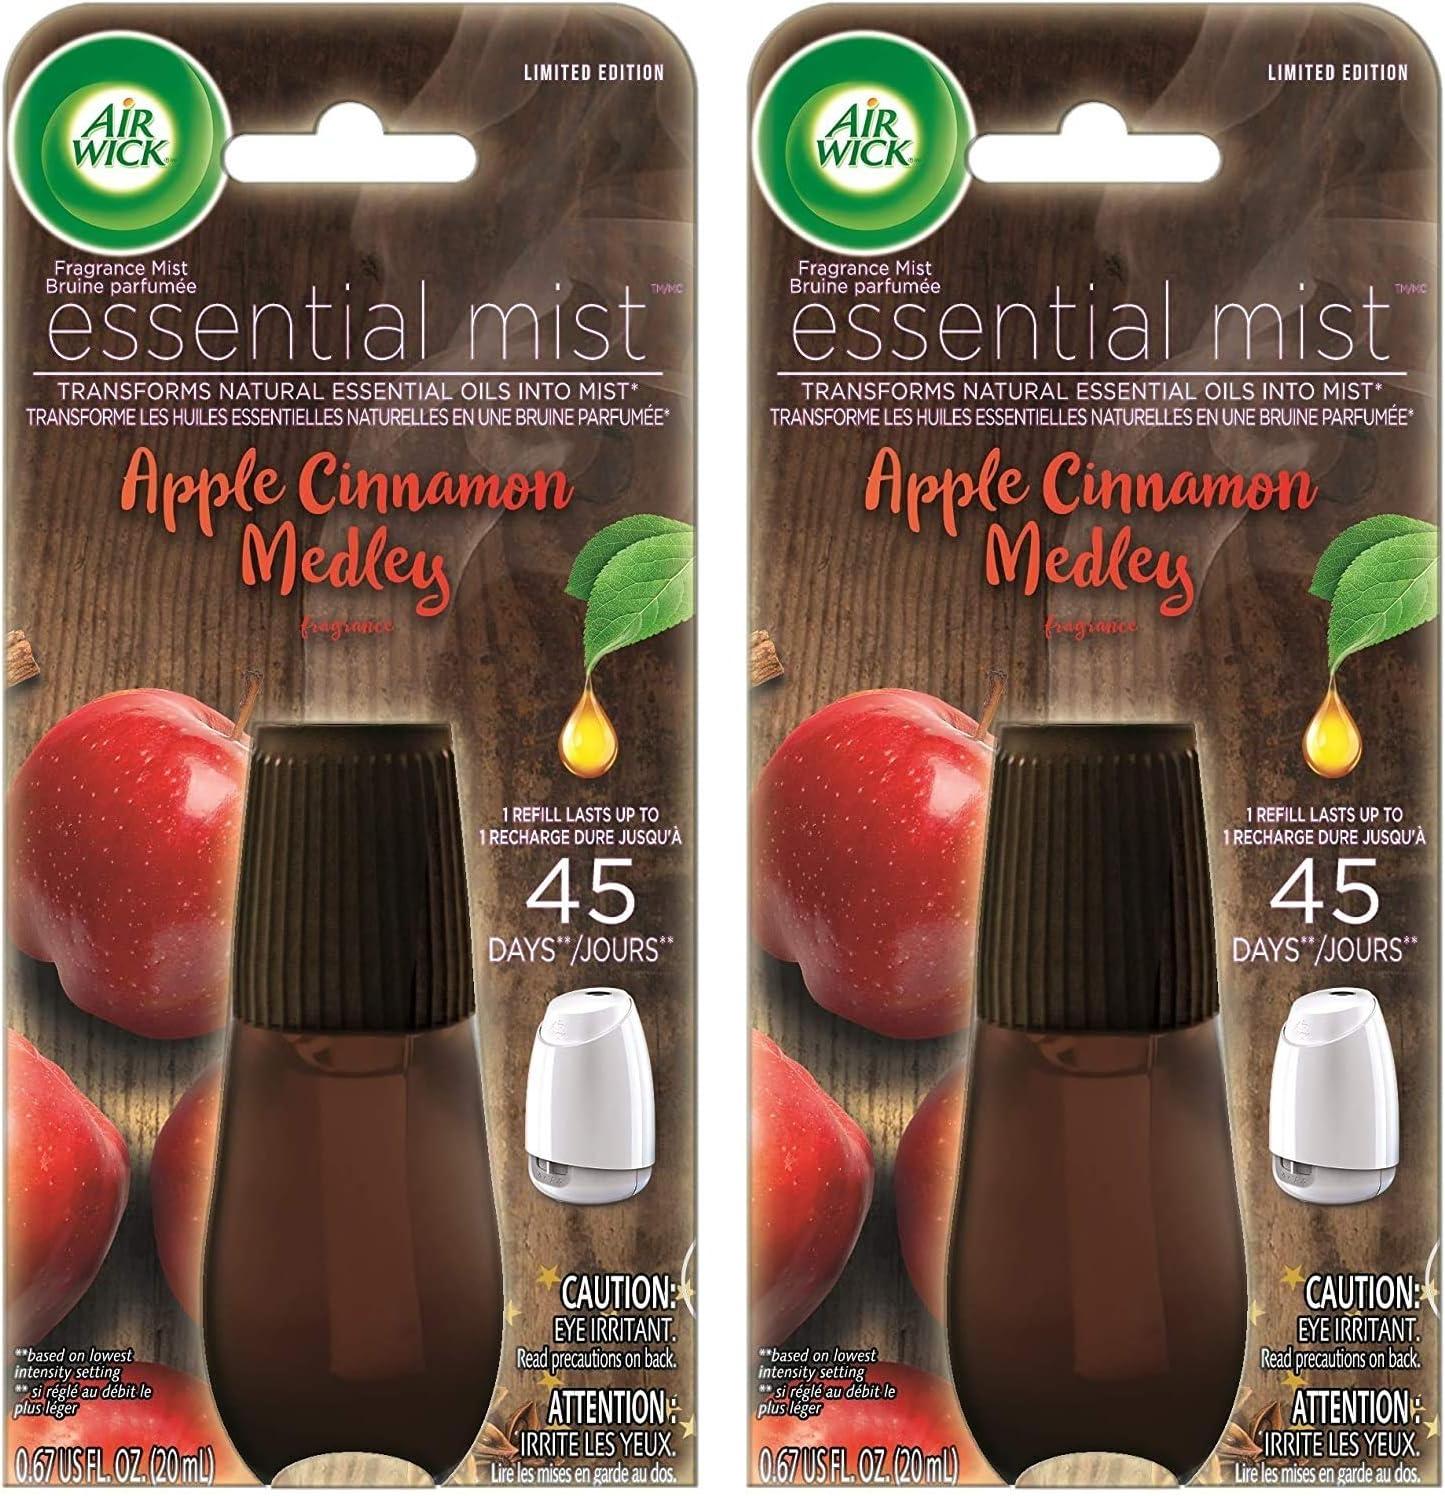 Air Wick Essential Mist Air Freshener Refill - Apple Cinnamon Medley - Net Wt. 0.67 FL OZ (20 mL) Per Refill - Pack of 2 Refills